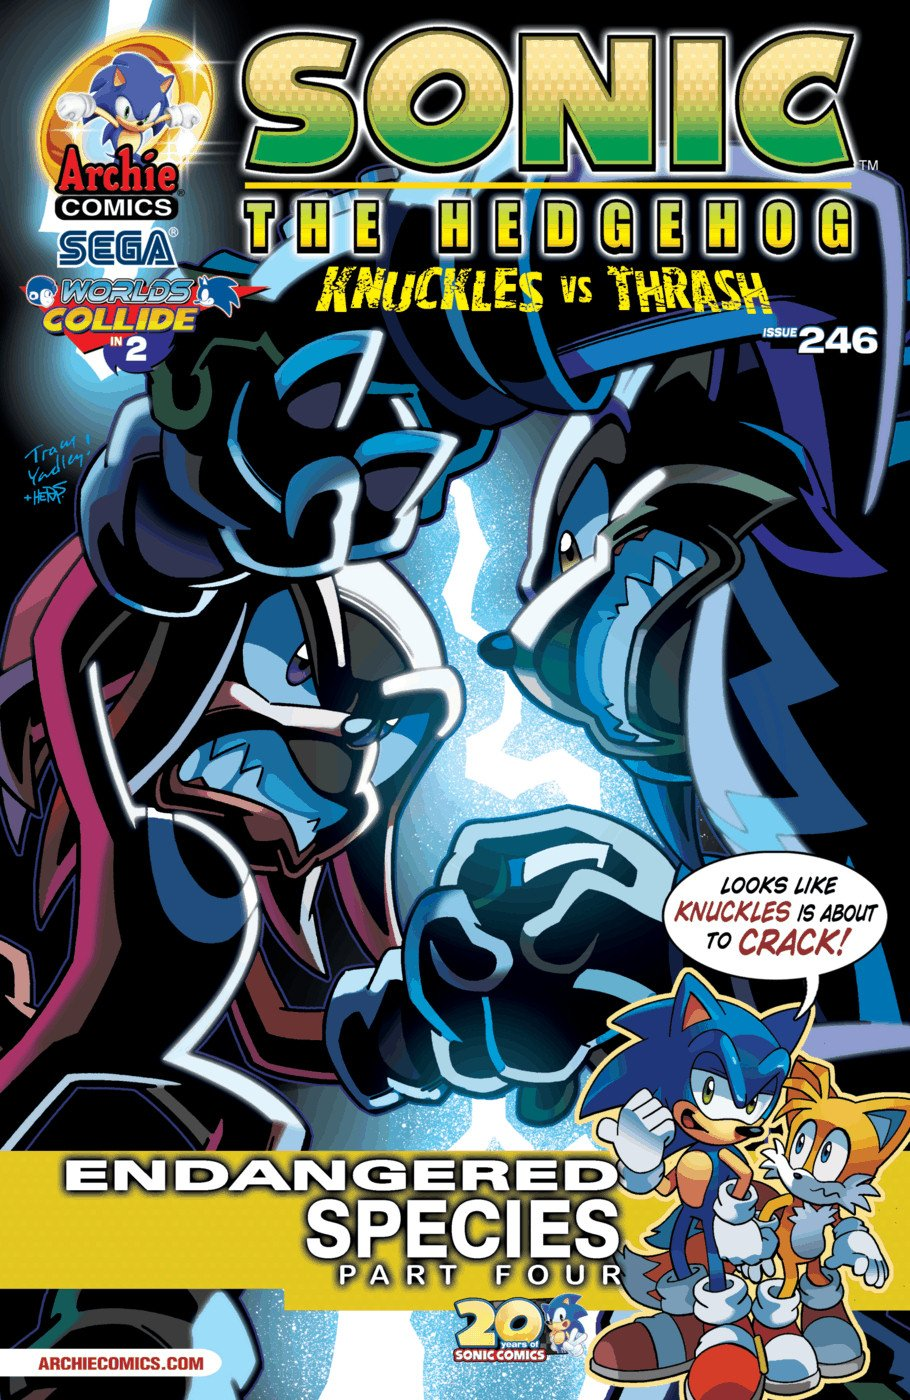 Sonic the Hedgehog 246 (April 2013)